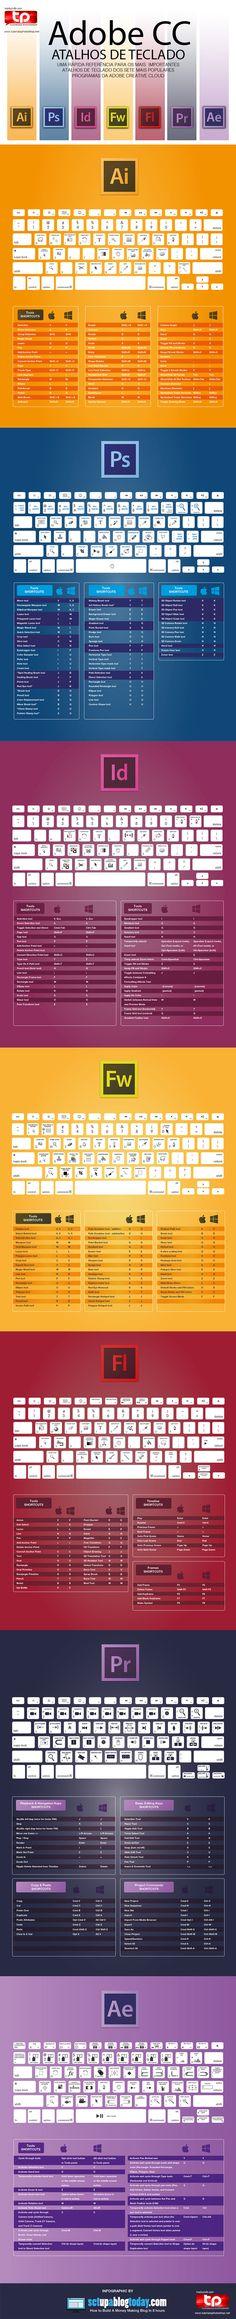 Infográfico: Atalho de teclado de programas da Adobe | ::Tutoriais Photoshop::